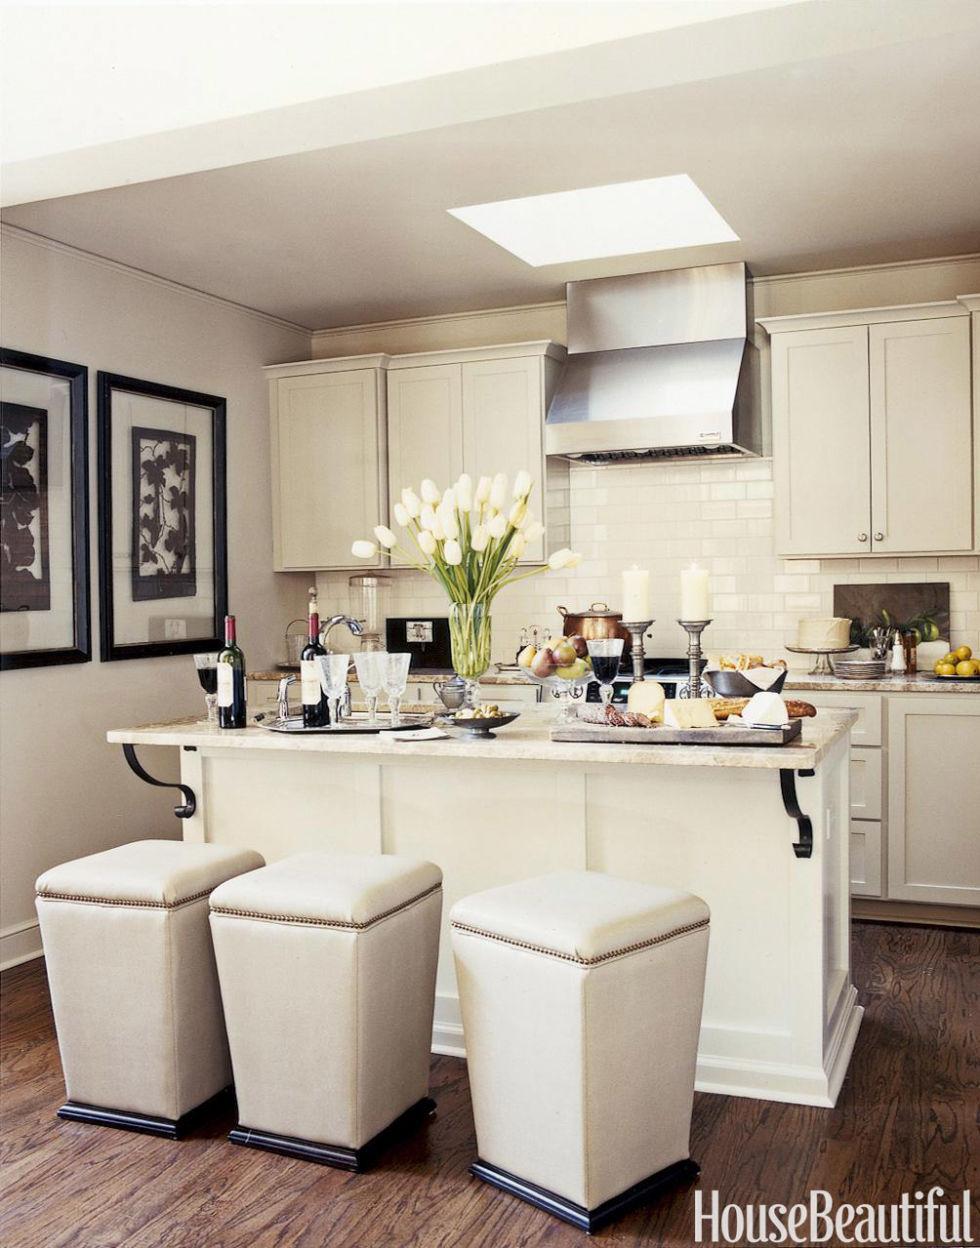 magic designer kitchens. top dream kitchen designs pictures of kitchens magic designer  with Kitchen Magic Recipes From Gizzius White Chocolate